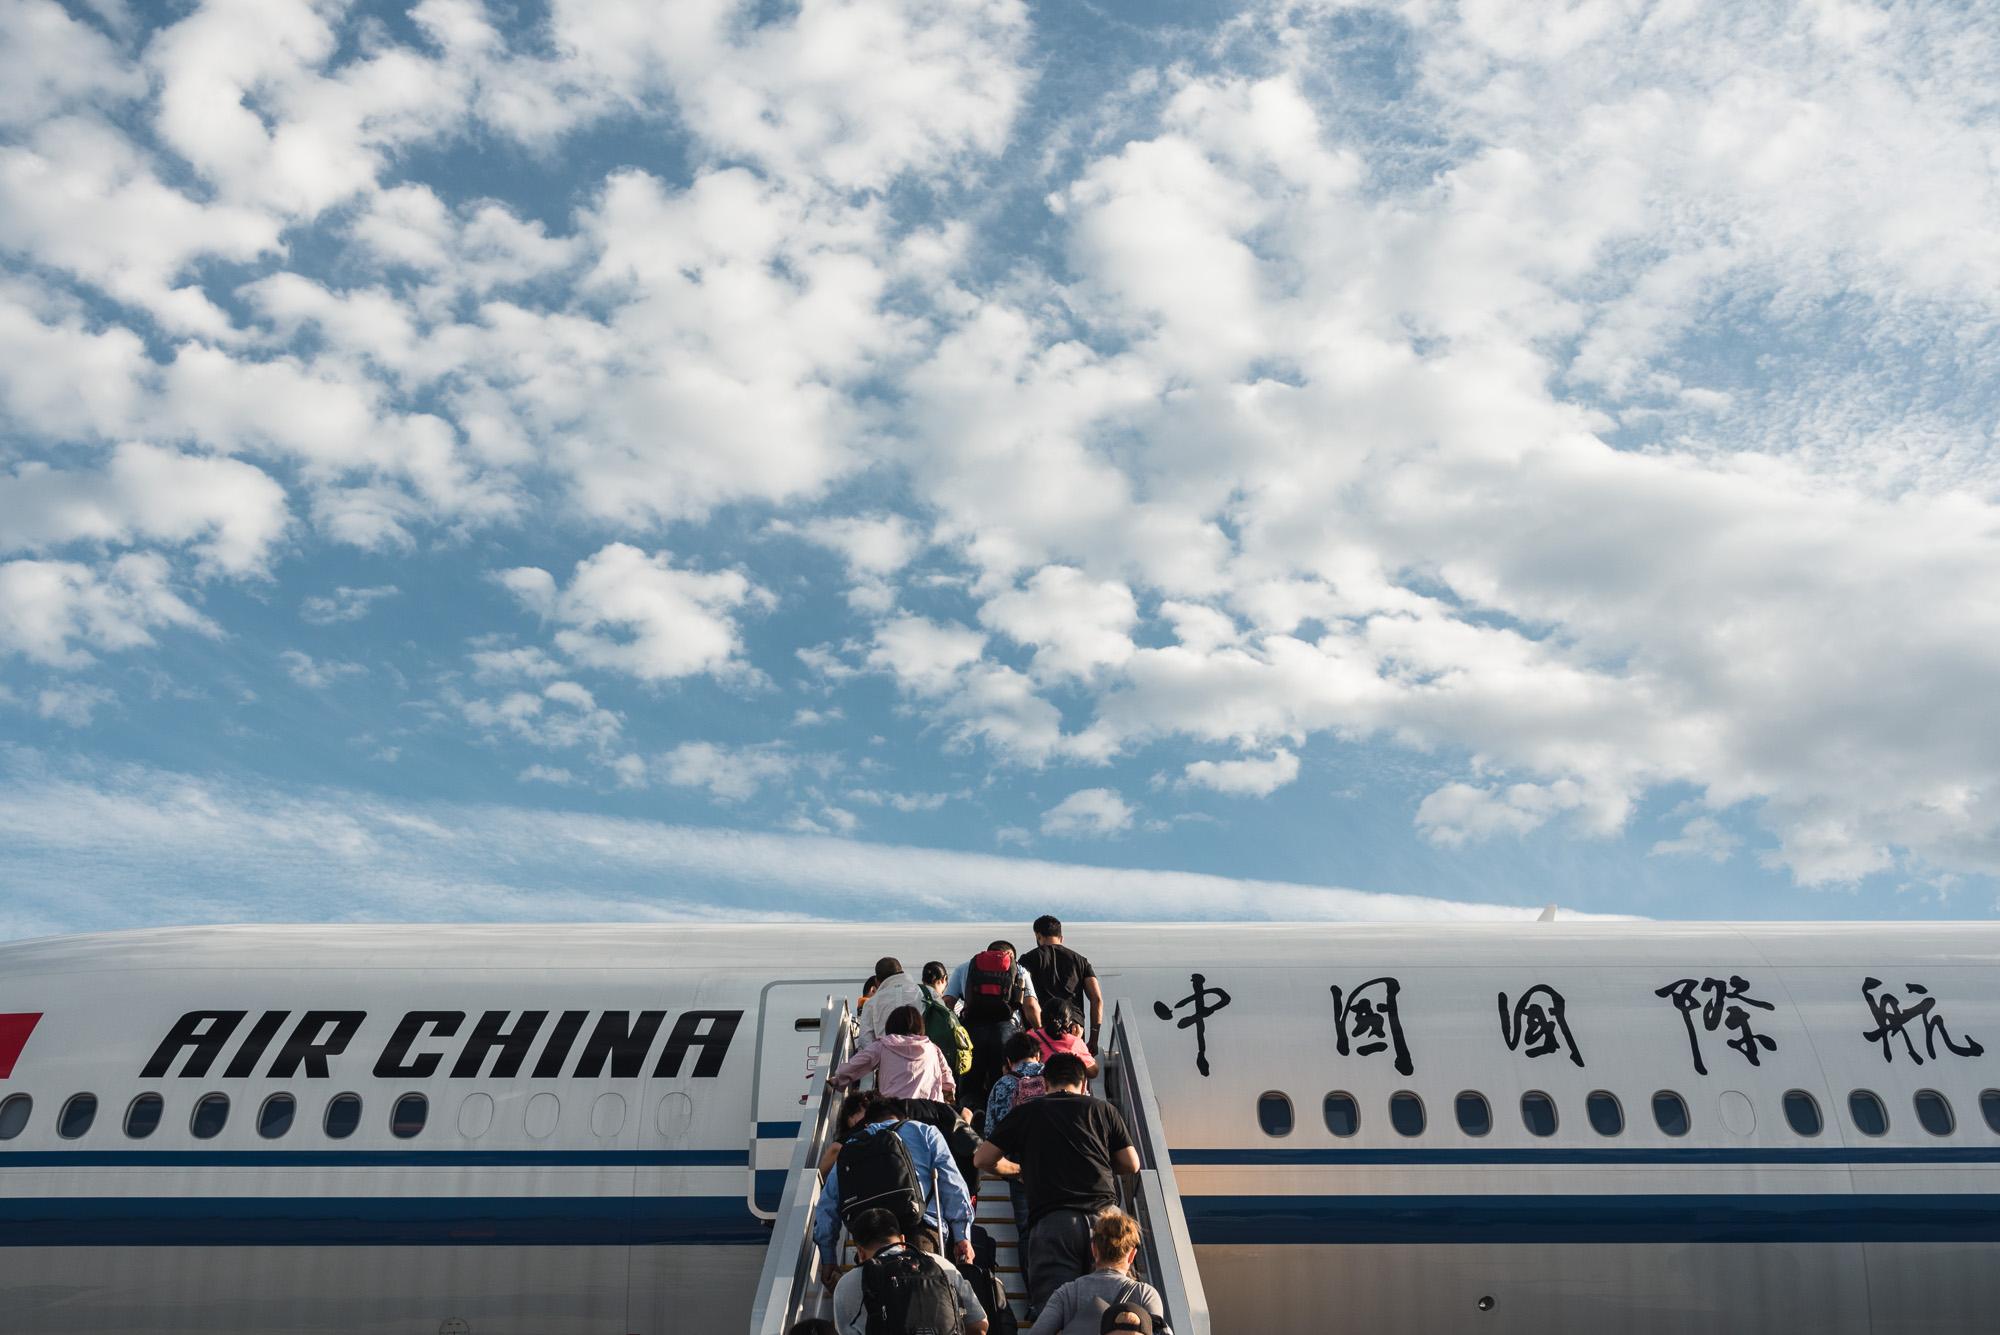 Boarding flight to go home